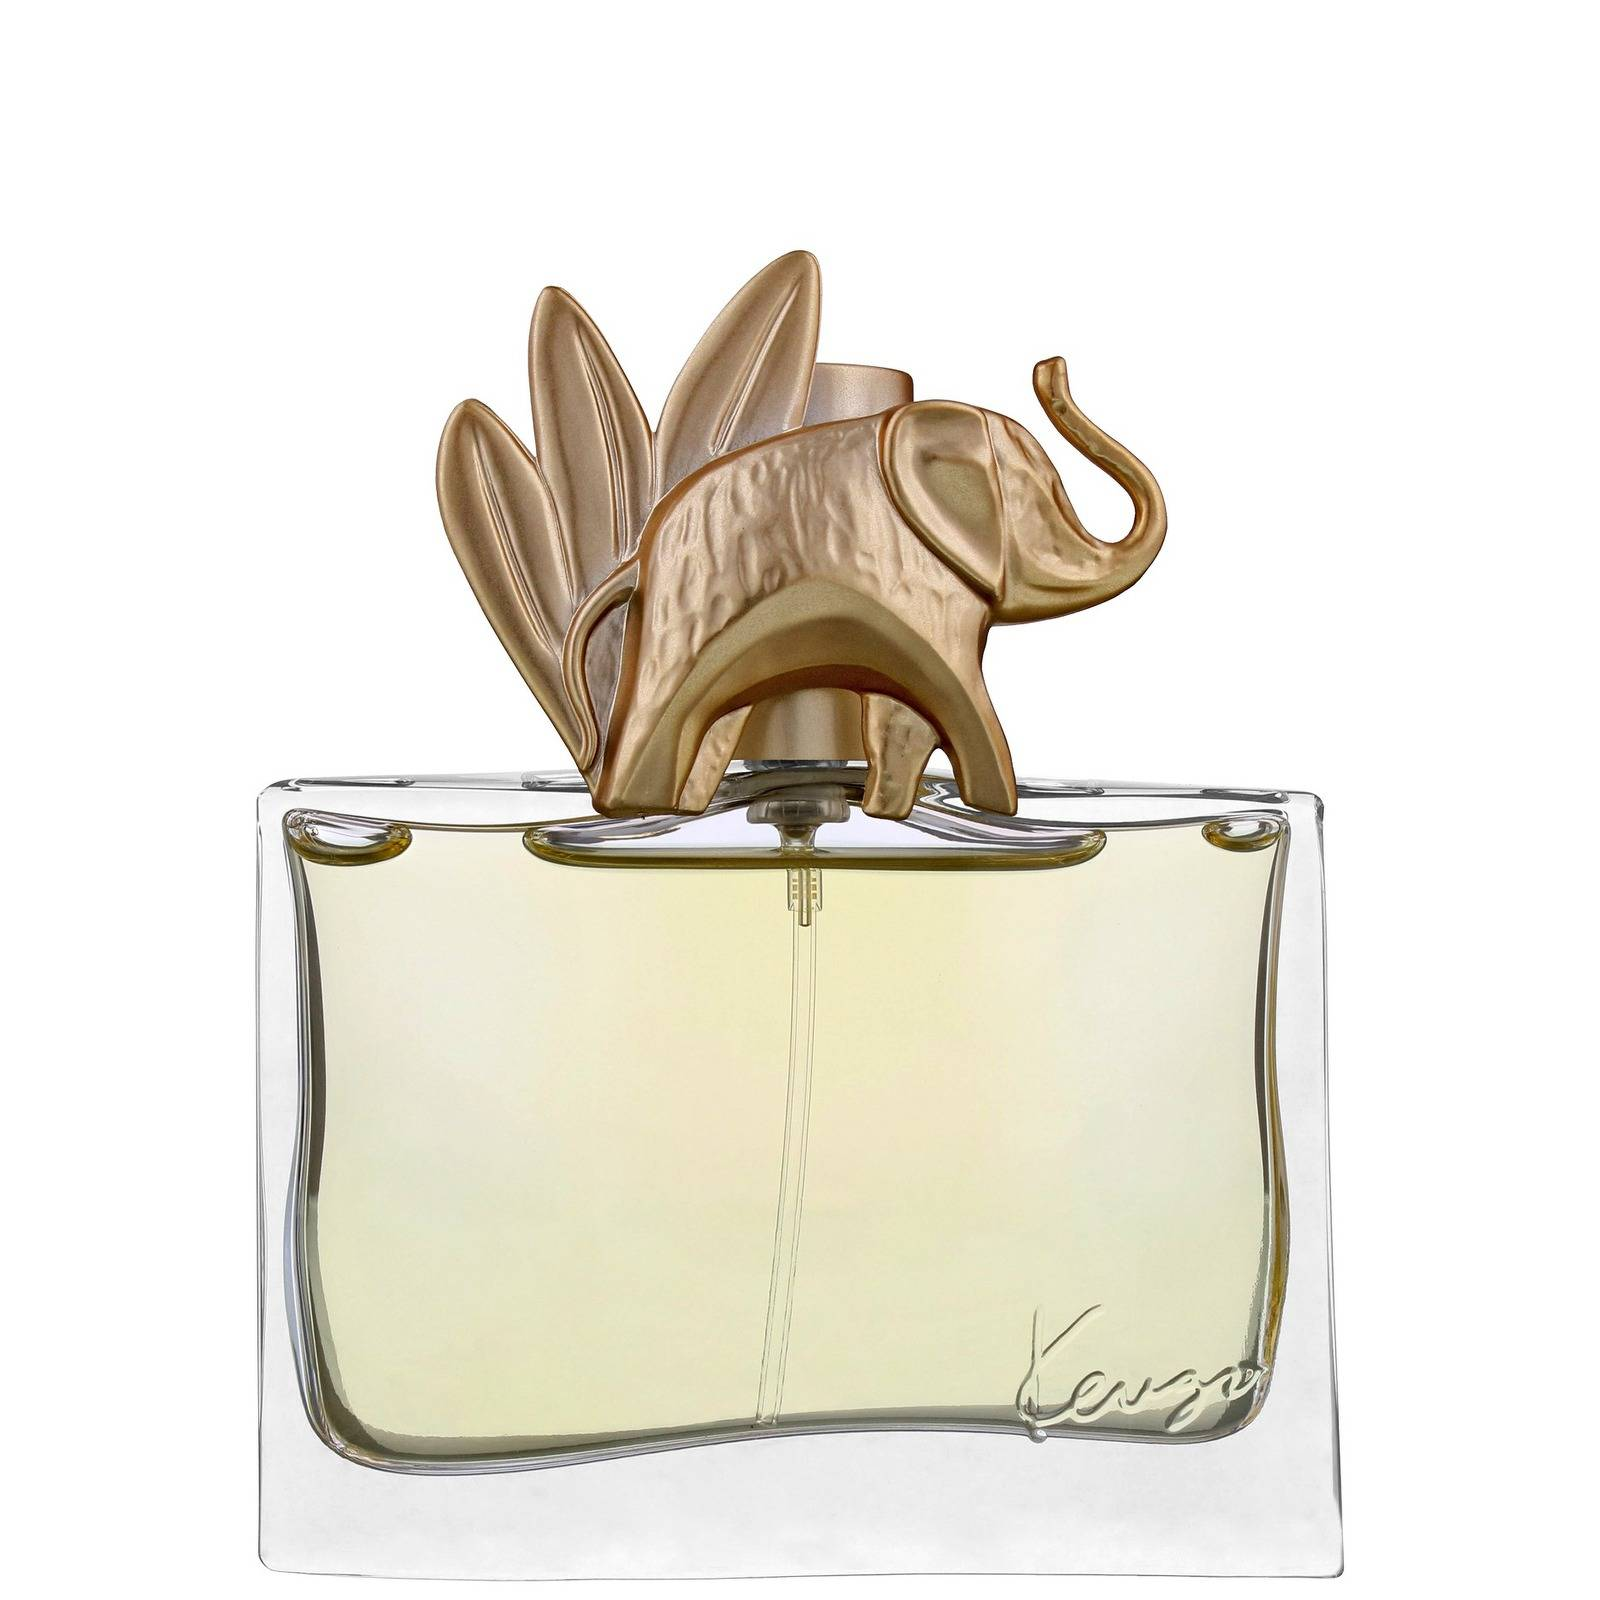 Kenzo Jungle LElephant 30ml Eau de Parfum Spray